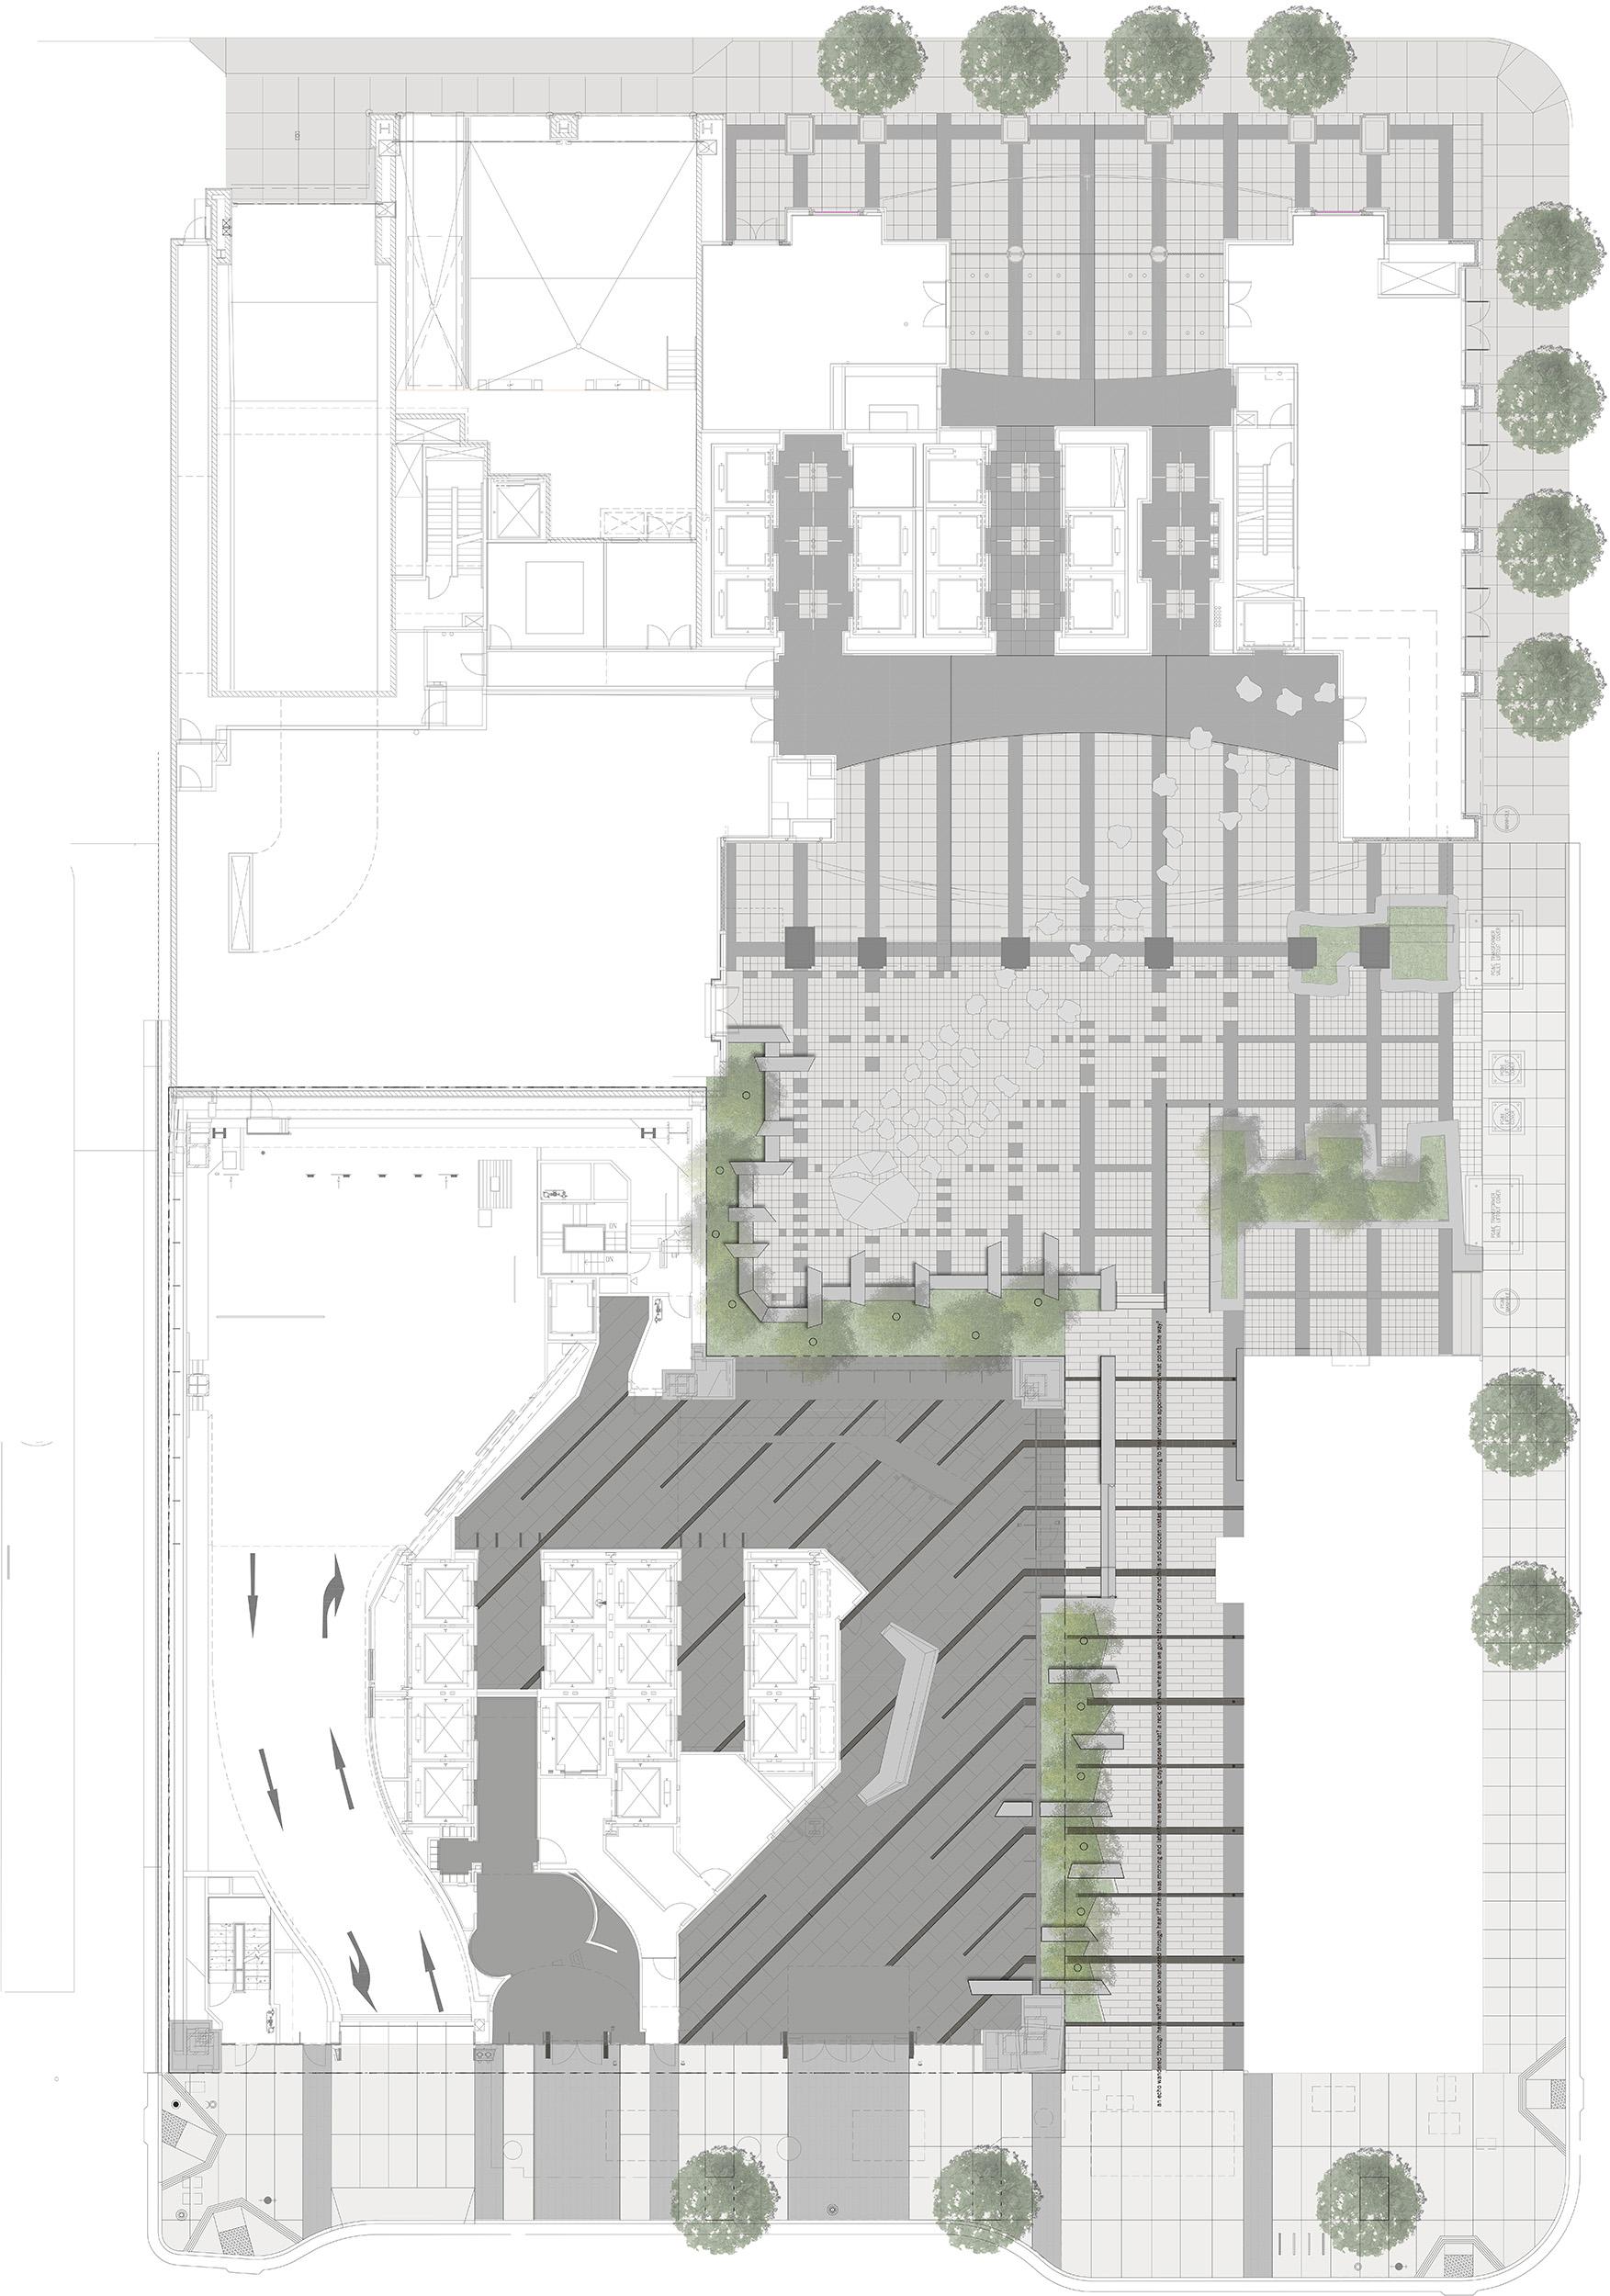 181-Fremont-Exterior-of-building.jpg